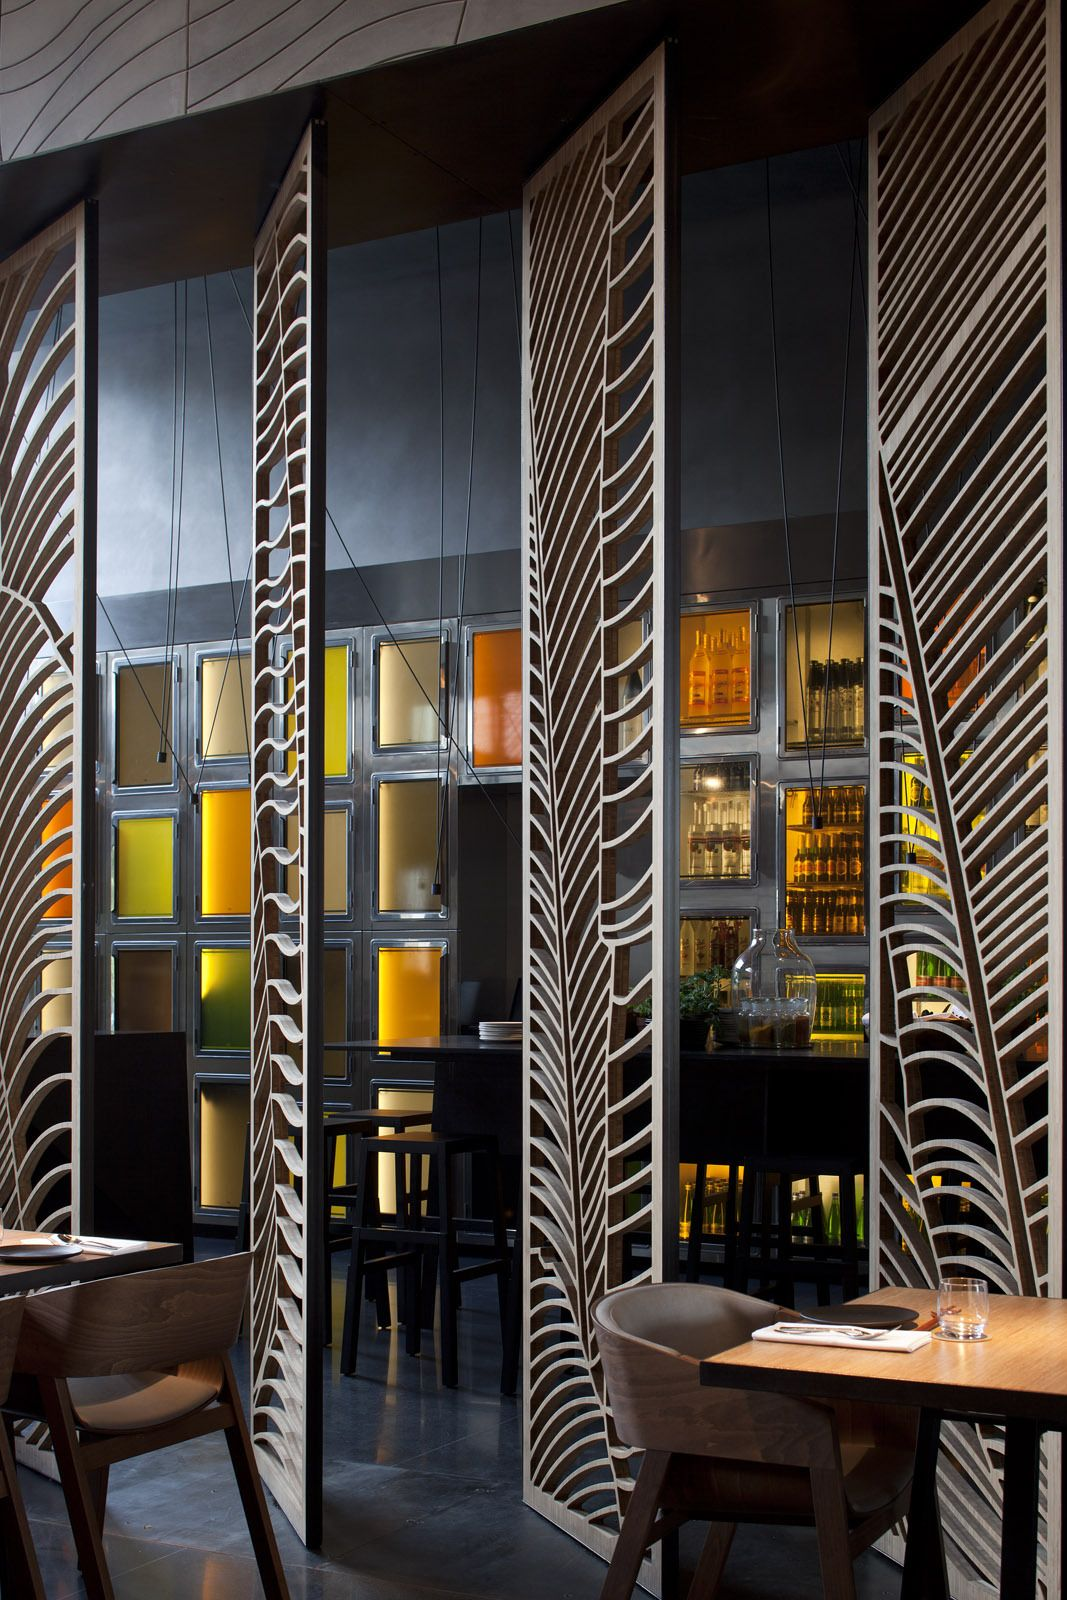 Galera de Restaurante Taizu Pitsou Kedem Architects Baranowitz